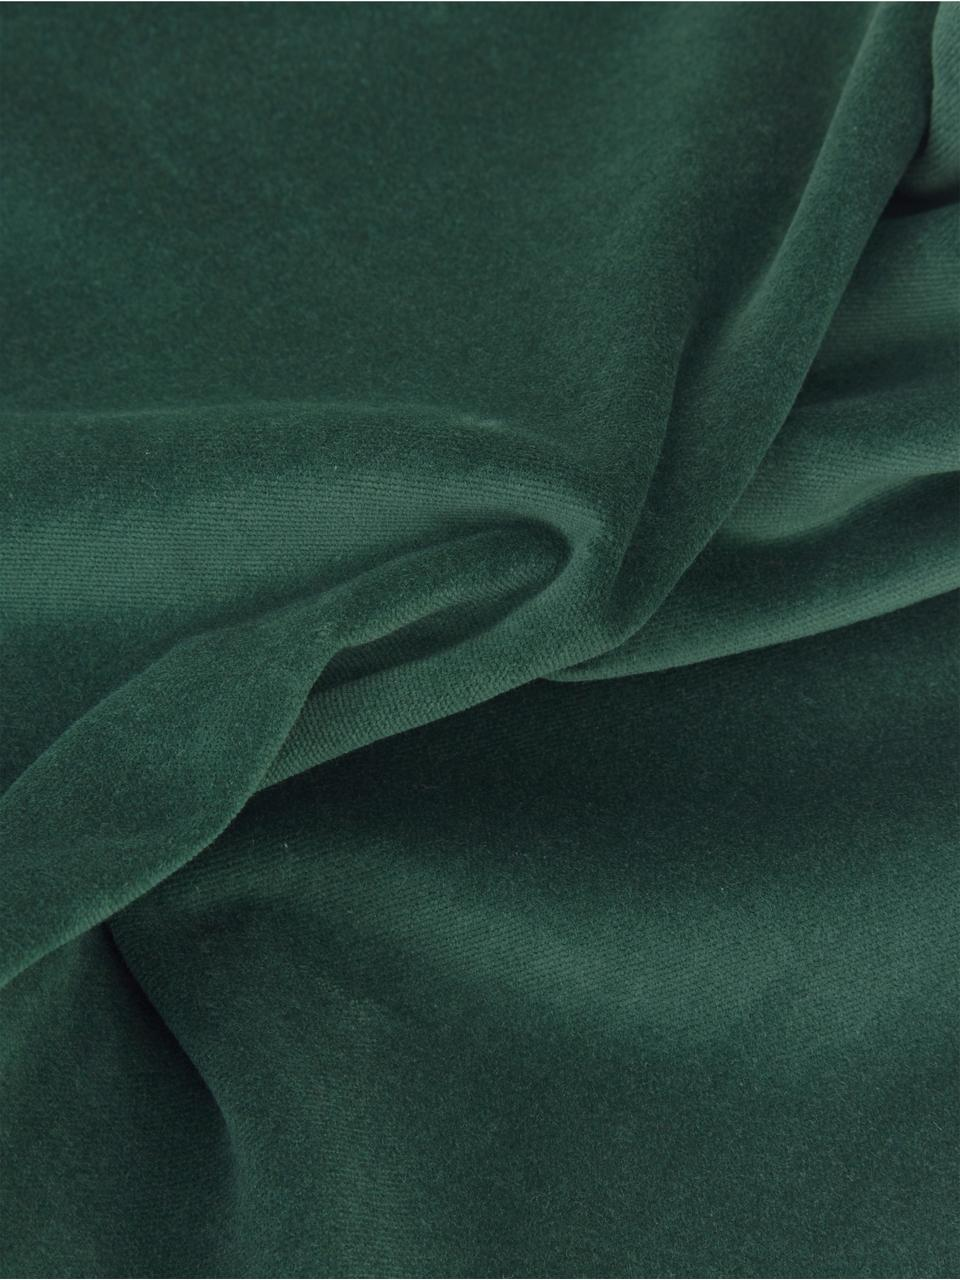 Effen fluwelen kussenhoes Dana in smaragdgroen, 100% katoenfluweel, Smaragdgroen, 40 x 40 cm